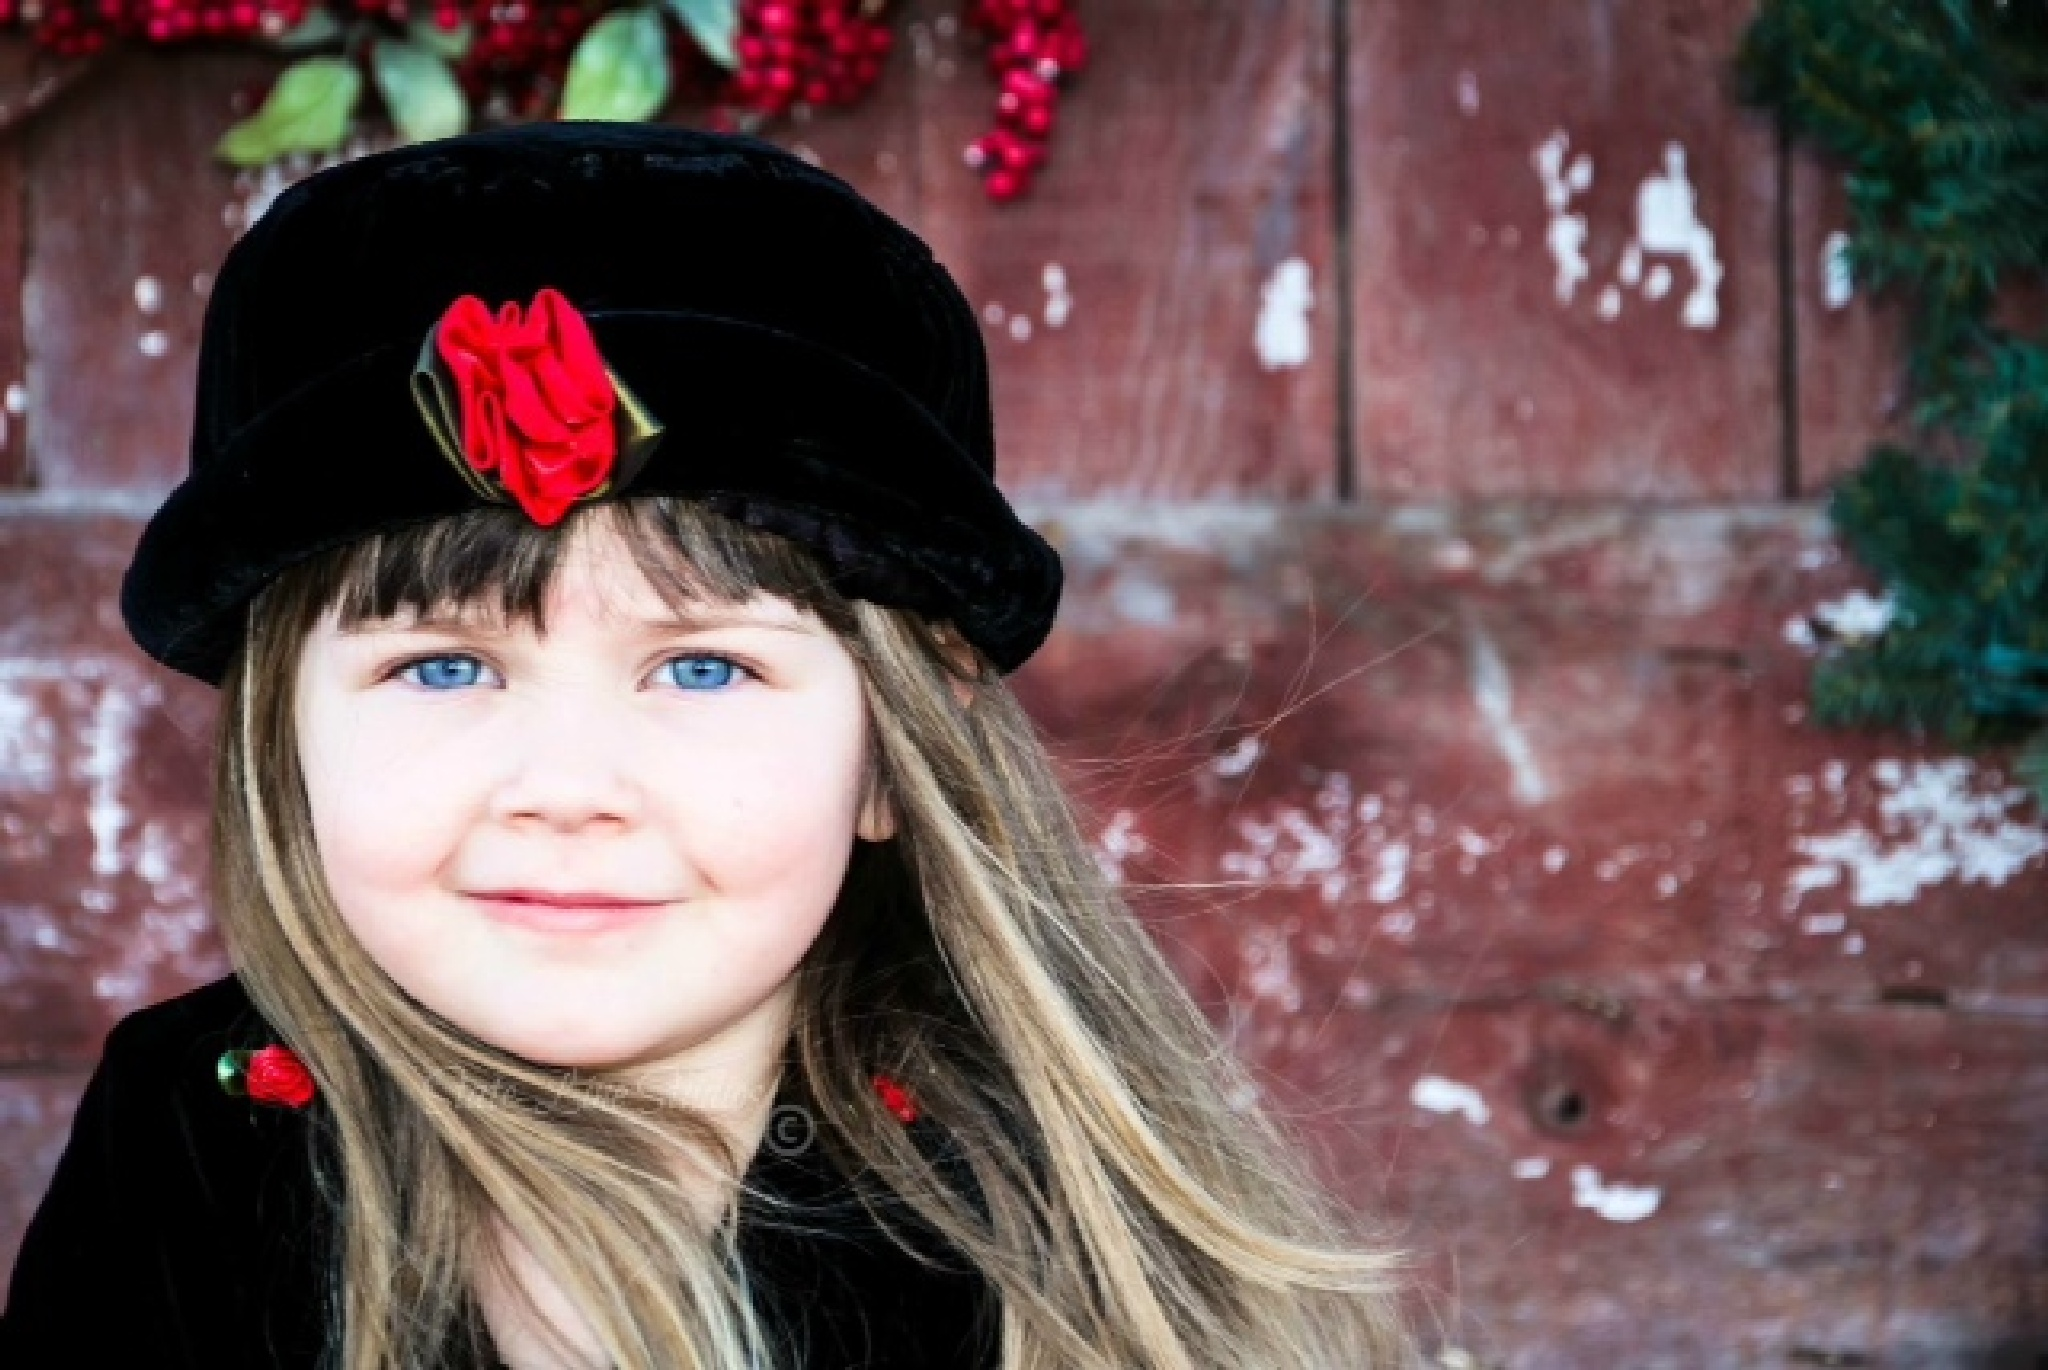 Waiting on Santa by Dixie L Colquhoun